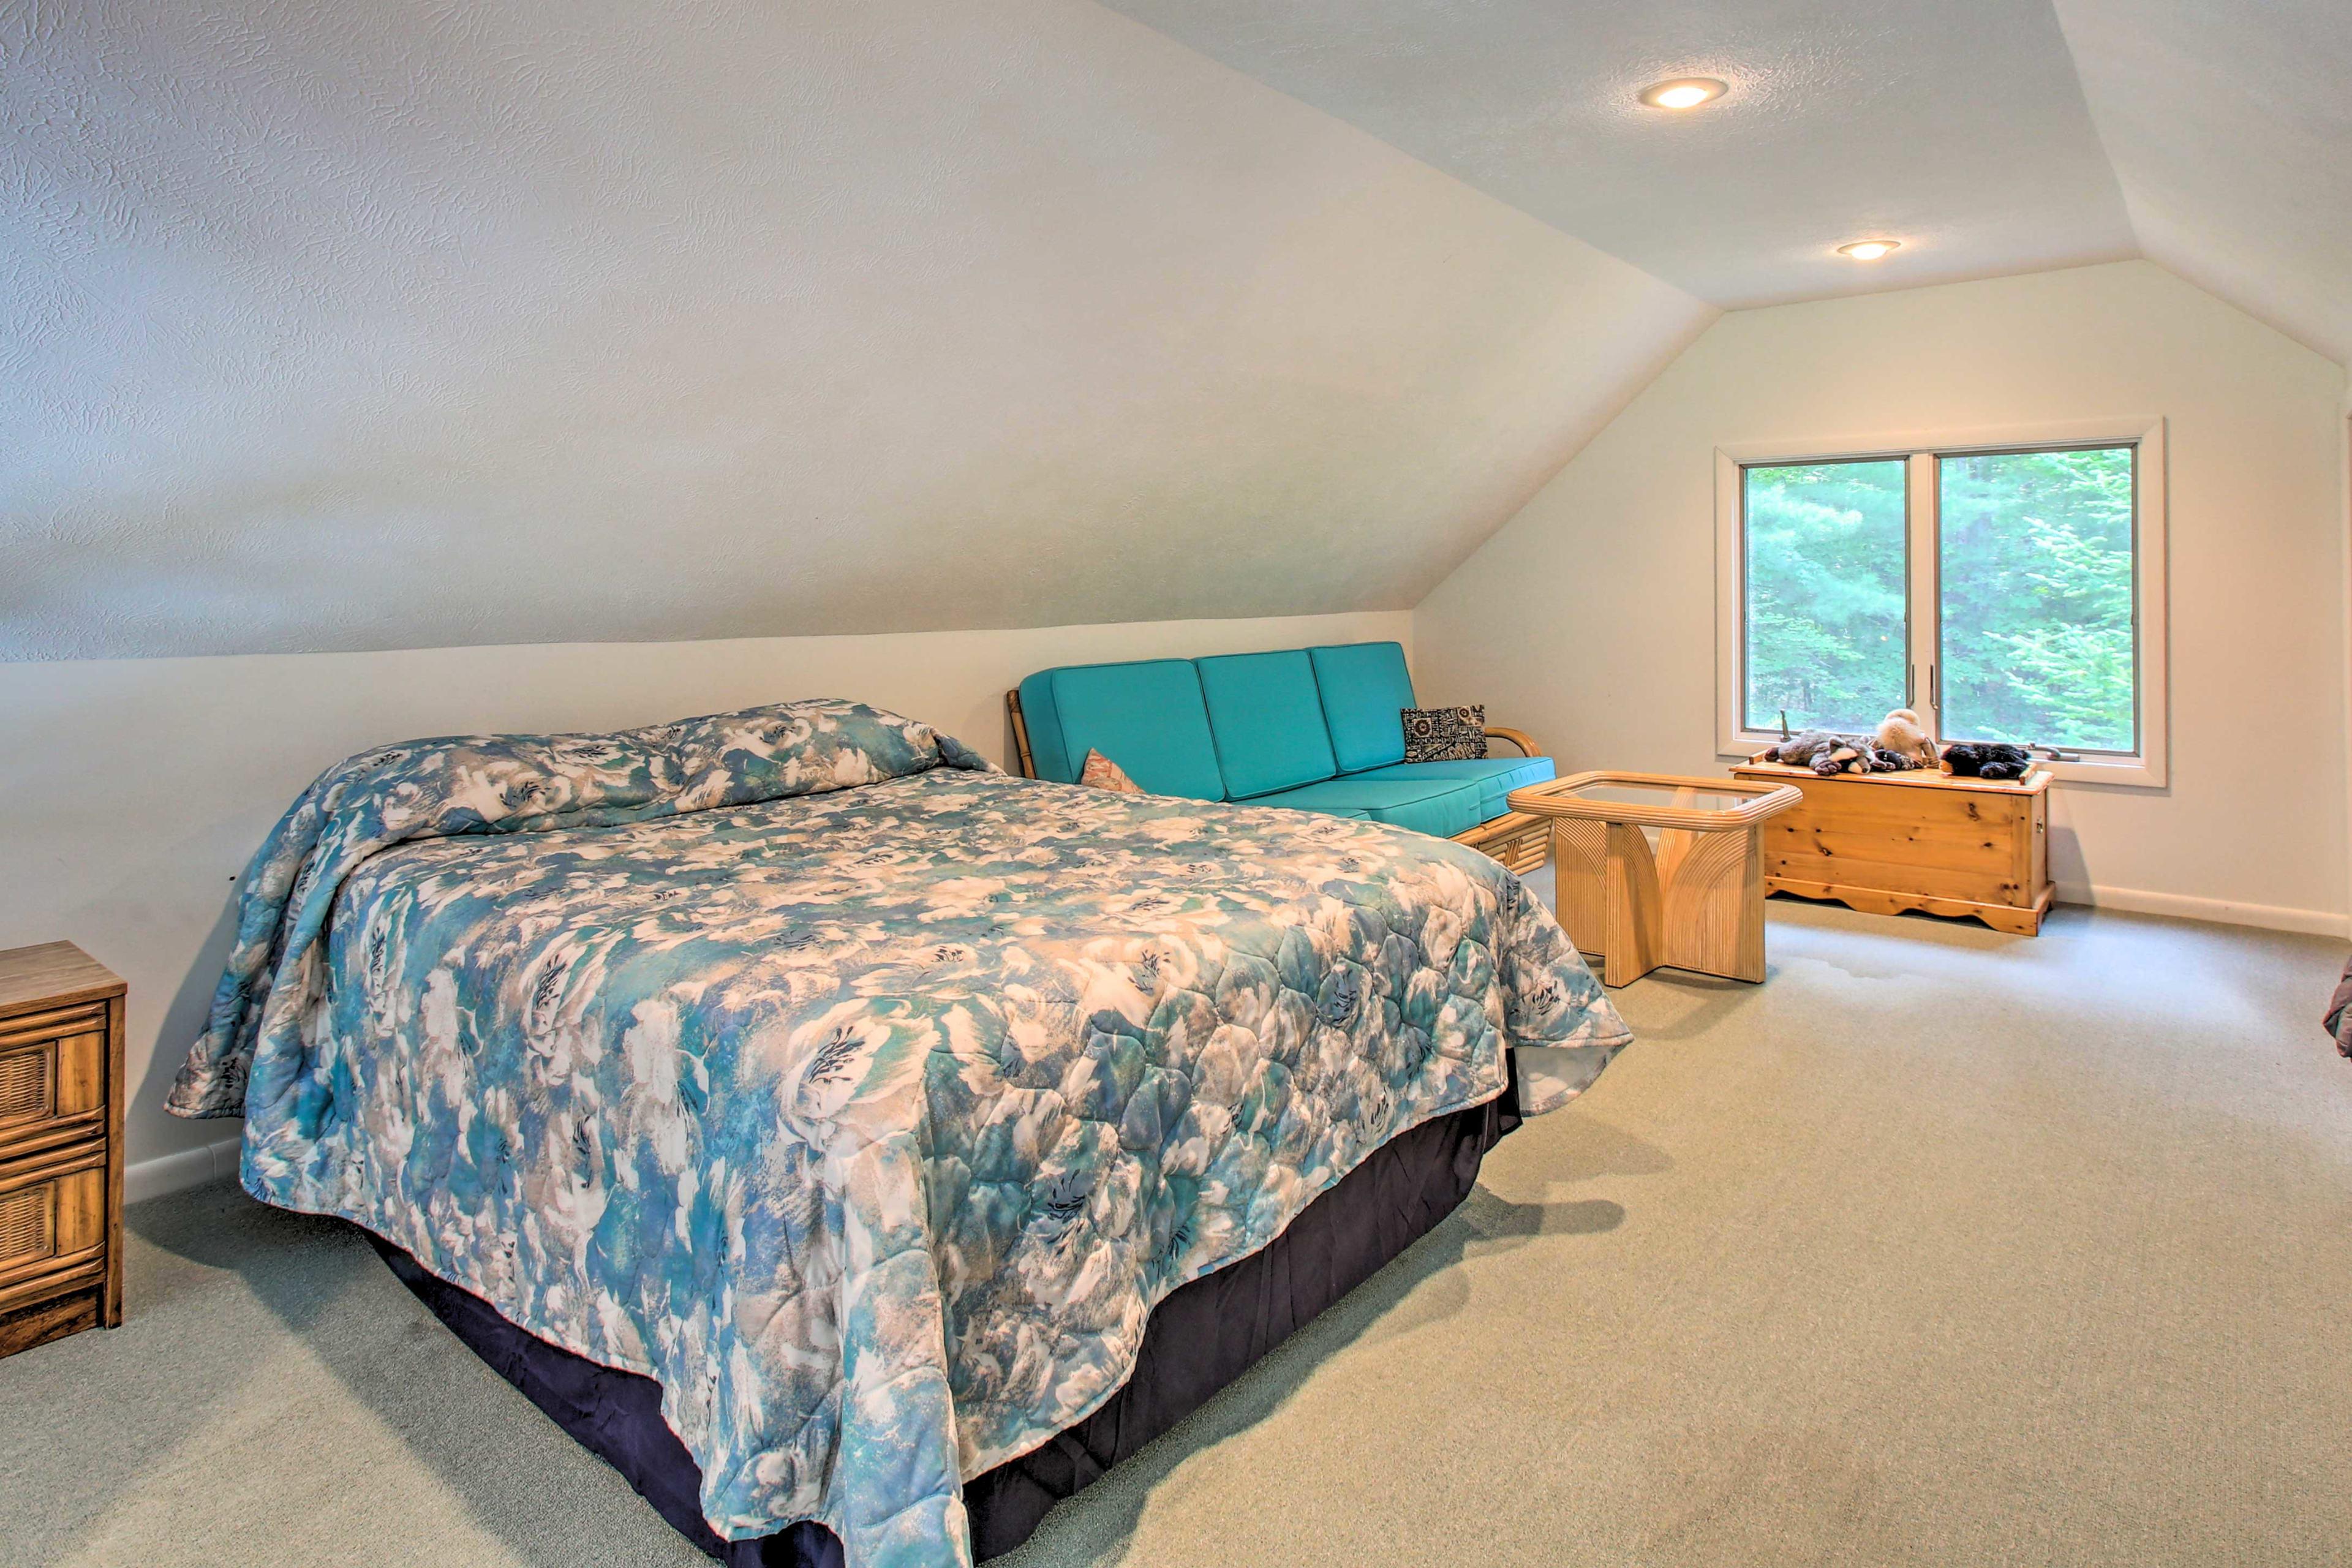 Head up to the loft bedroom.